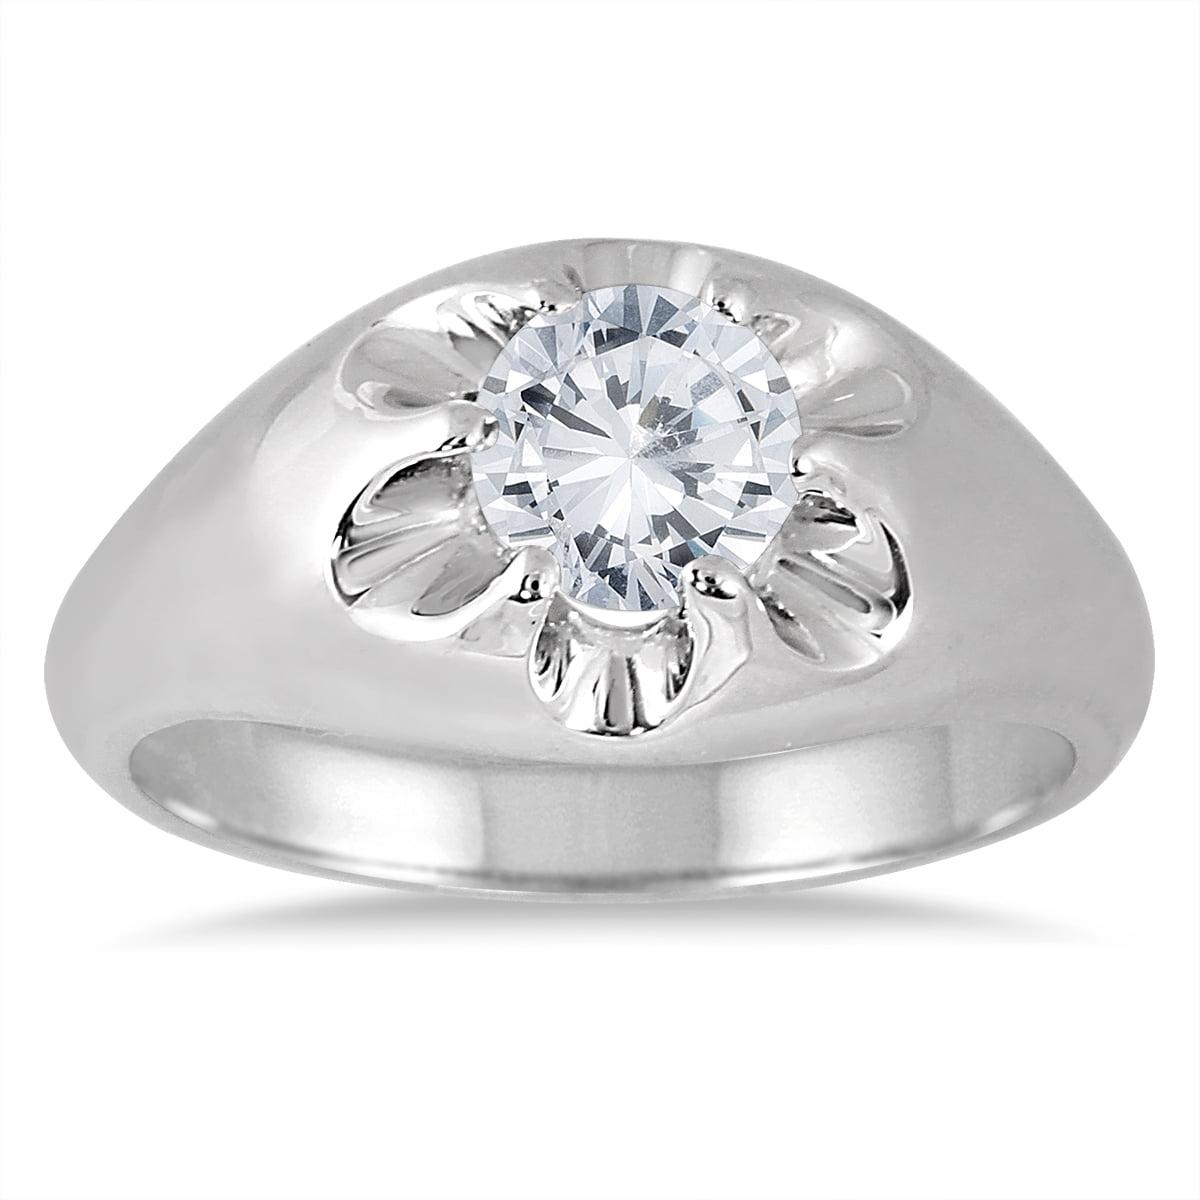 Szul Ags Certified 1 Carat Men S Diamond Solitaire Ring